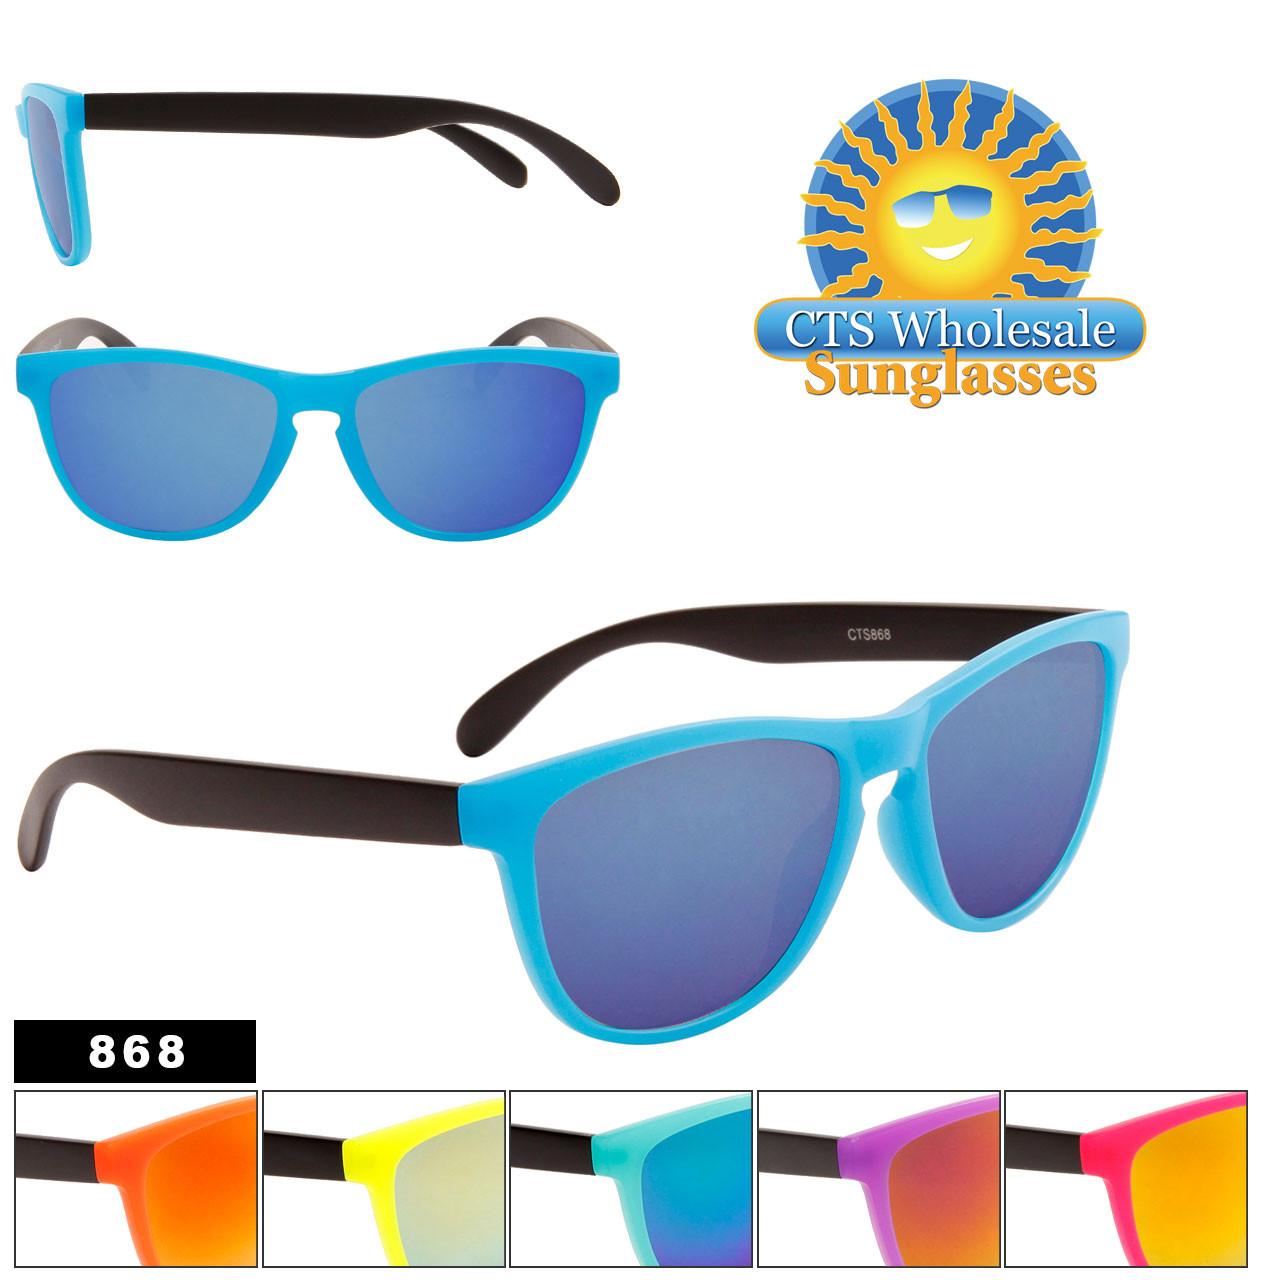 Mirrored Unisex Sunglasses - Style #868